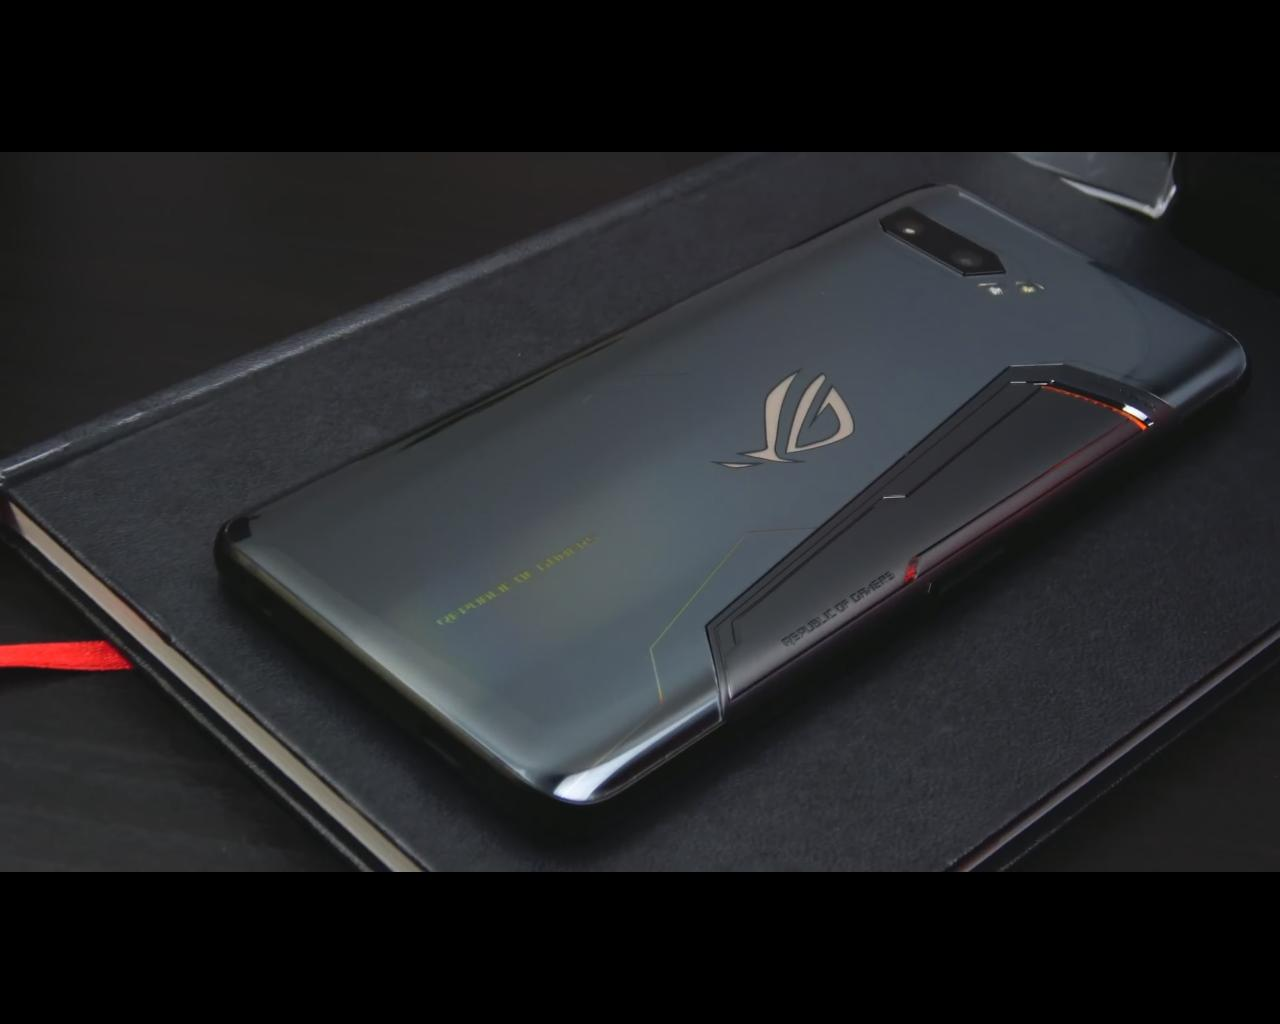 asus rog phone 2 android gaming